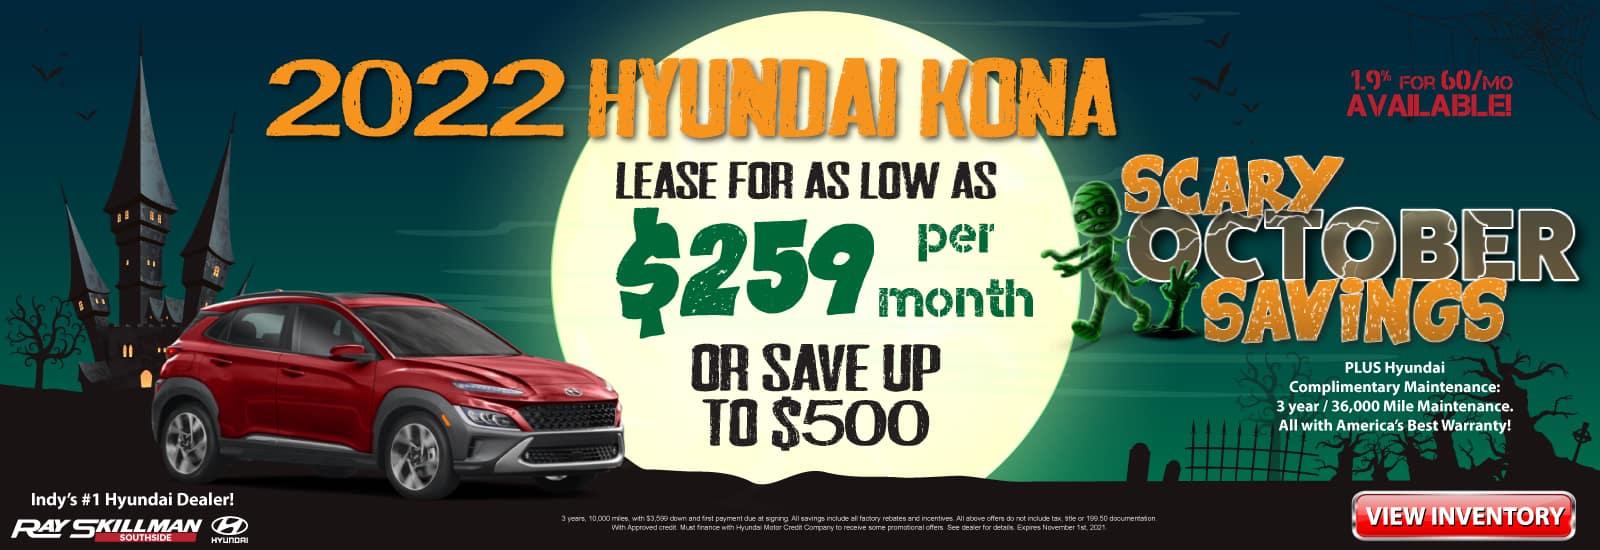 2022-Hyundai-Kona-Web-Banner-1600×550 (002).jpg Oct